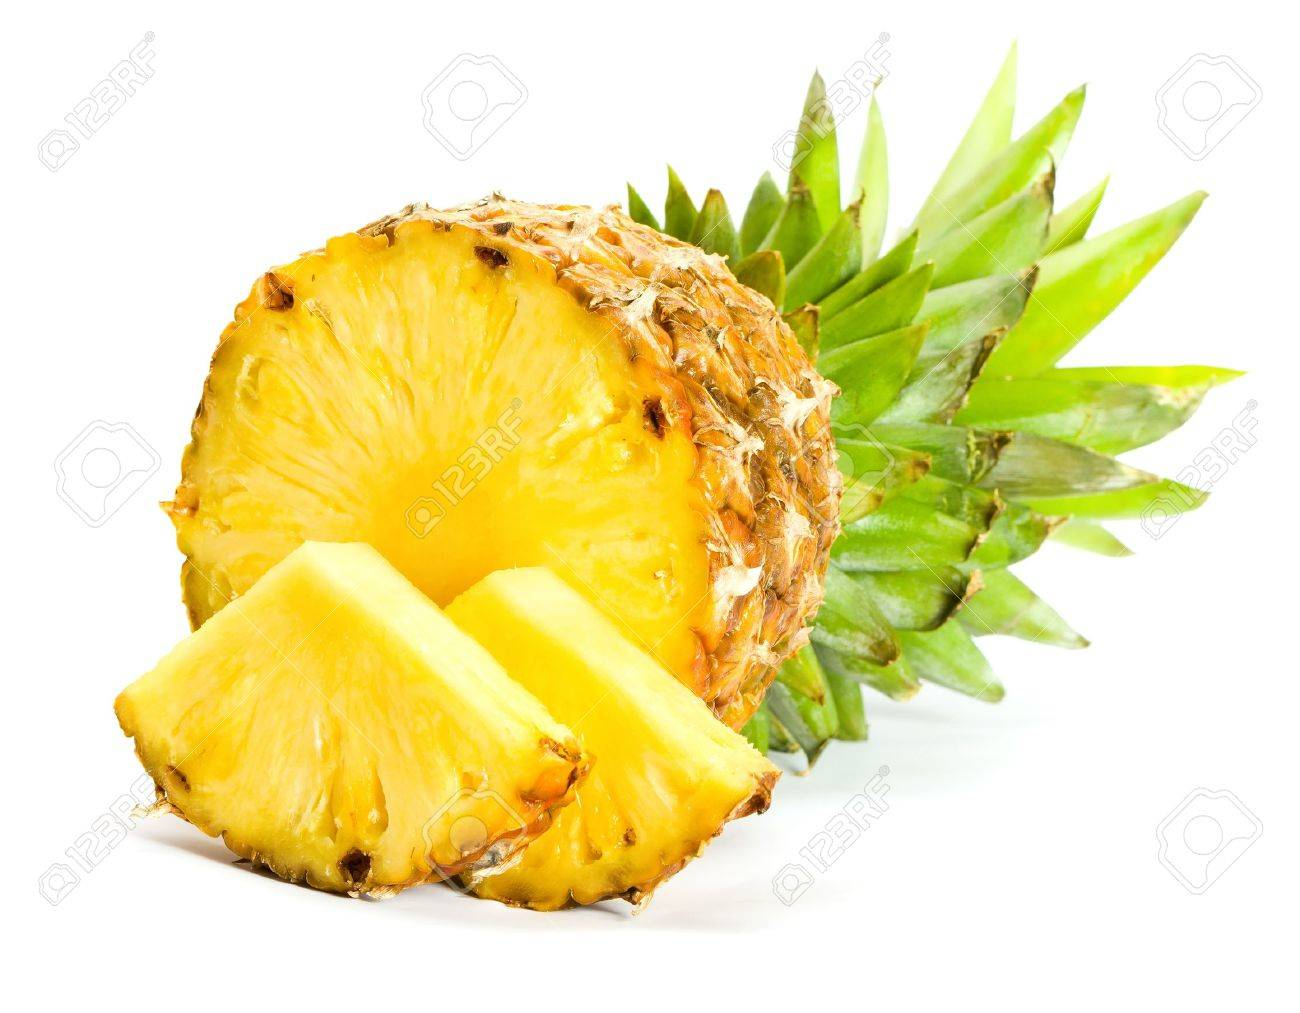 Fresh slice pineapple on white background - 8775635